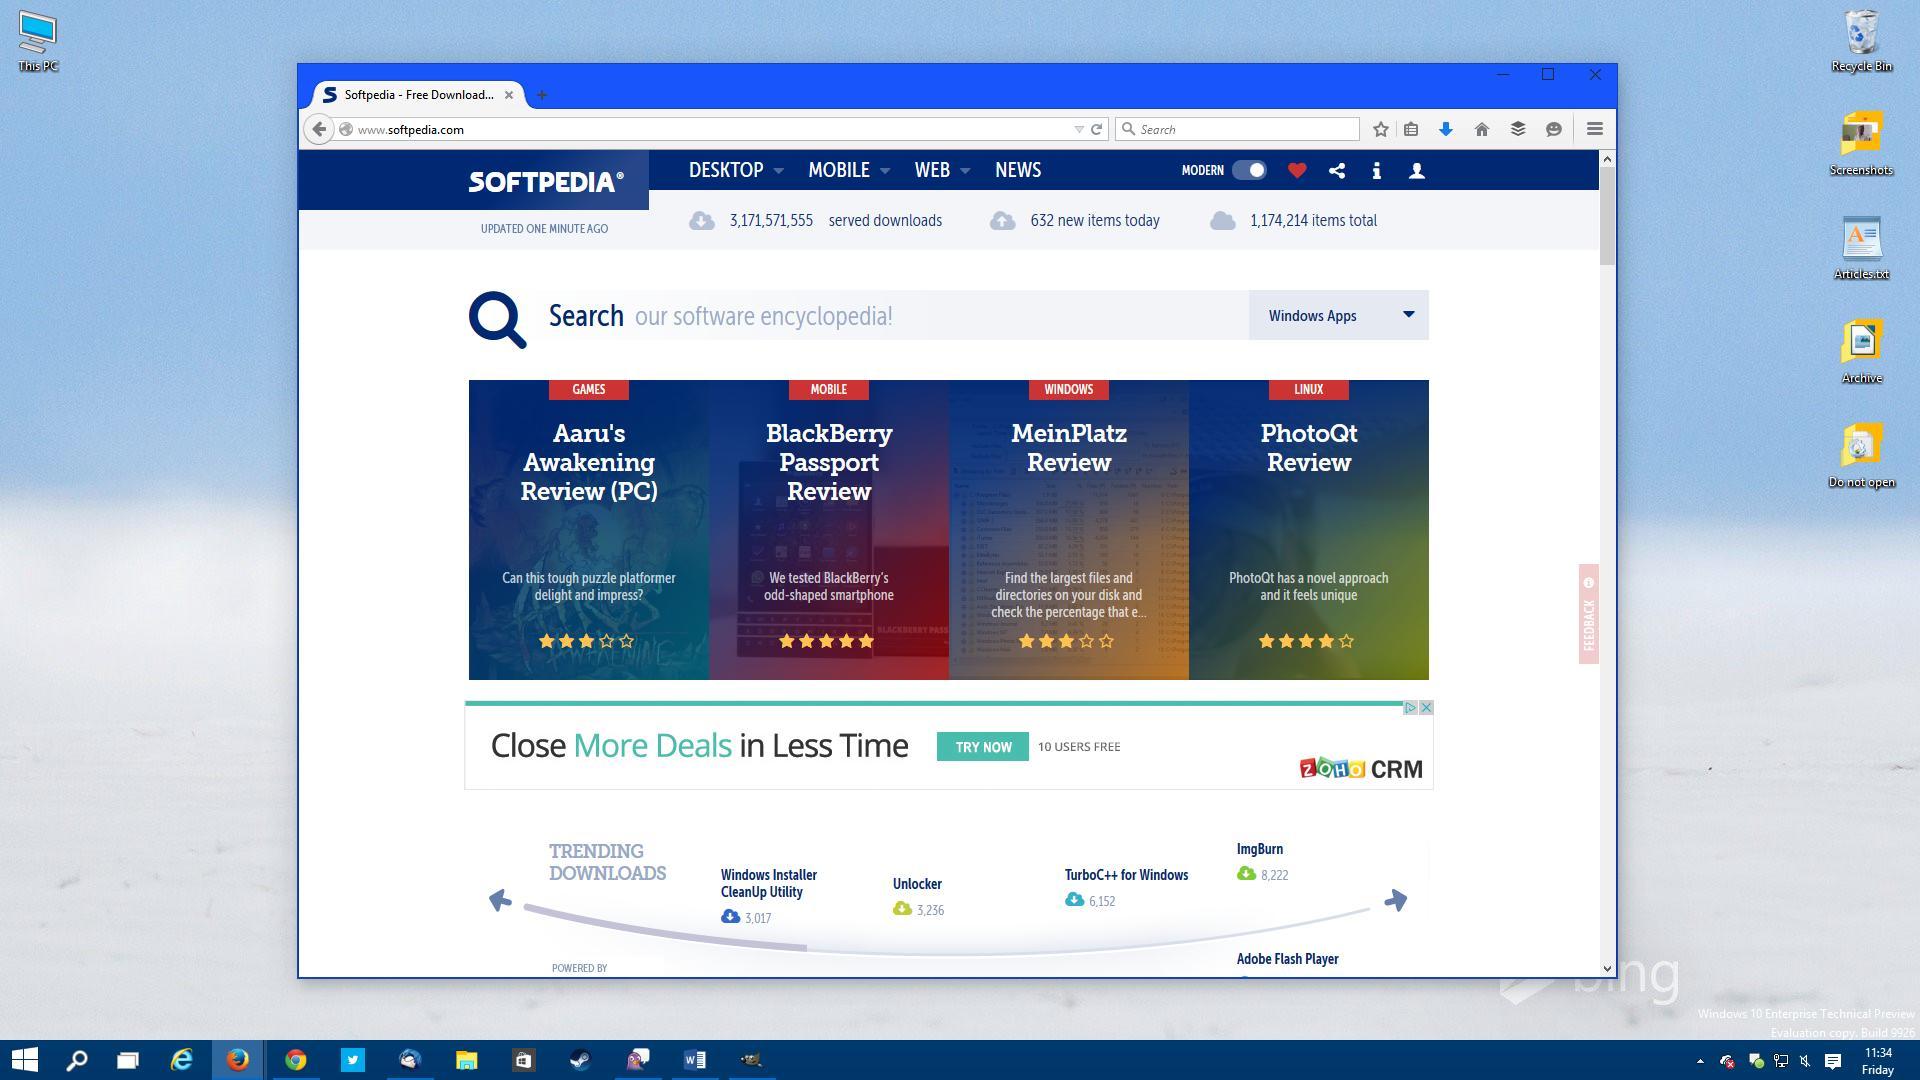 firefox 64 bit download windows 10